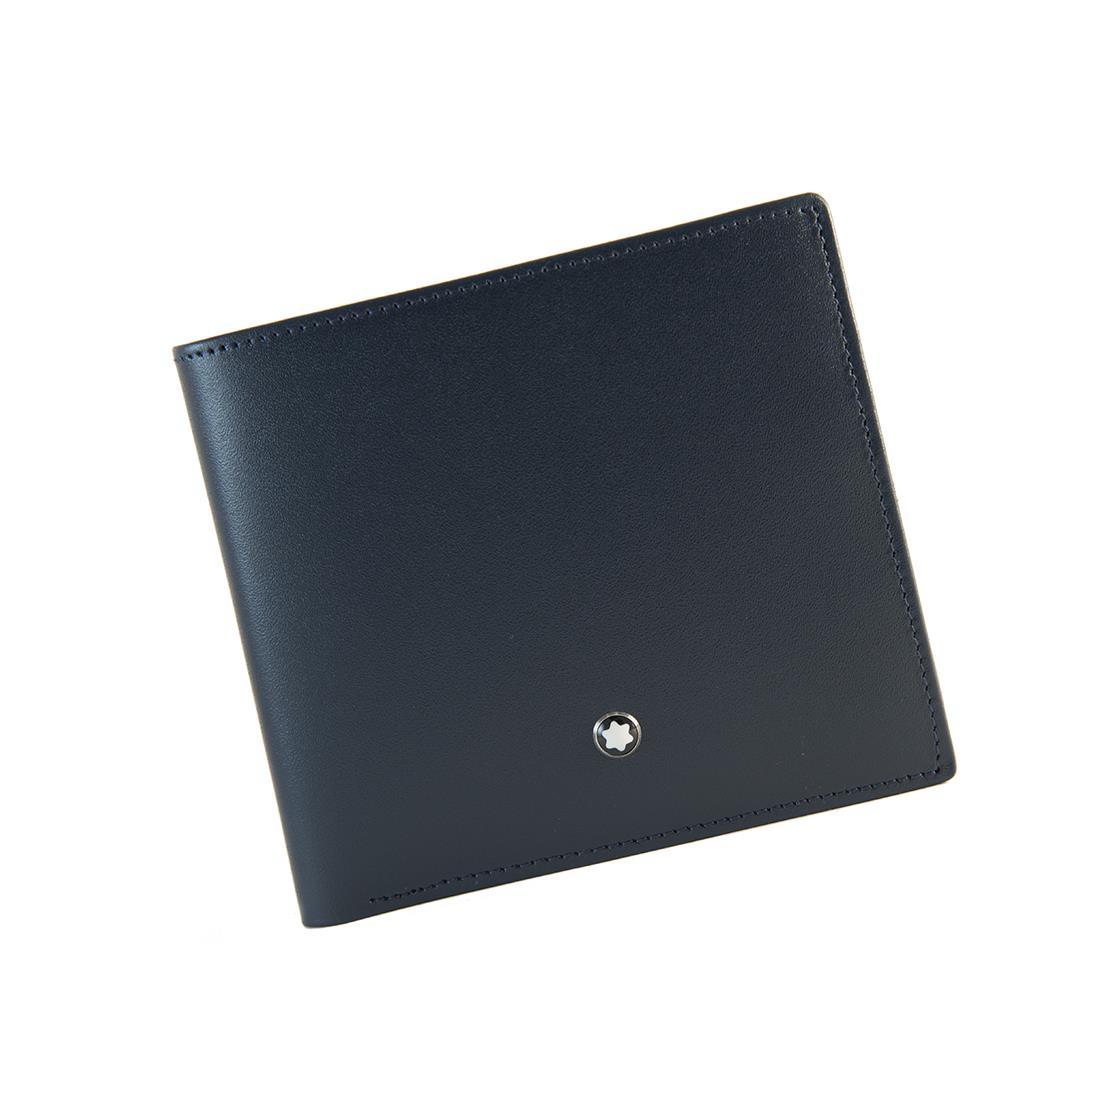 MONTBLANC Portafoglio montblanc multiscomparto con portamonete